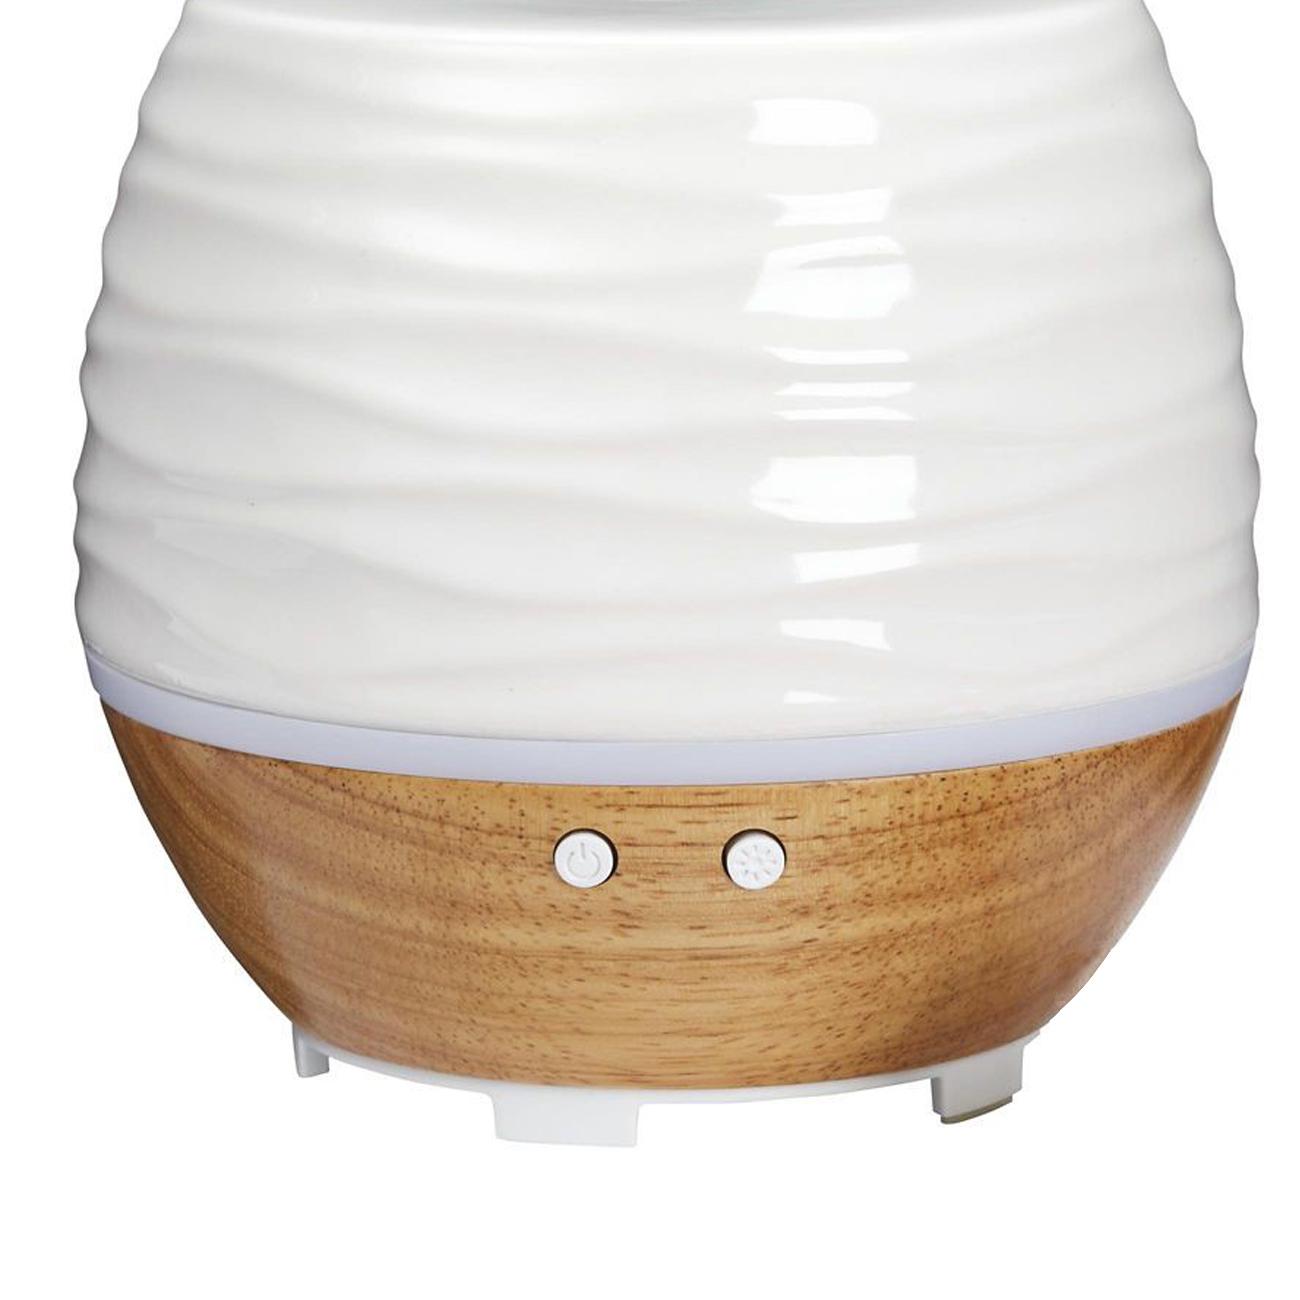 Difusor de aroma e umidificado ultrassônico 130ml Ellia